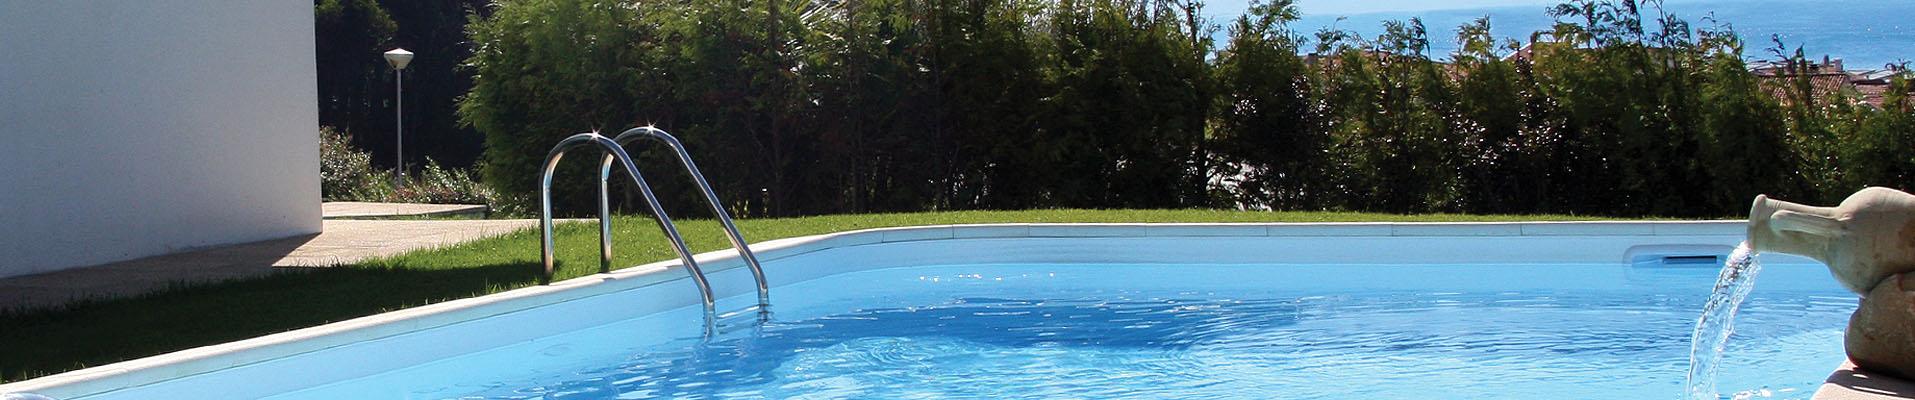 tratamento_de-piscinas